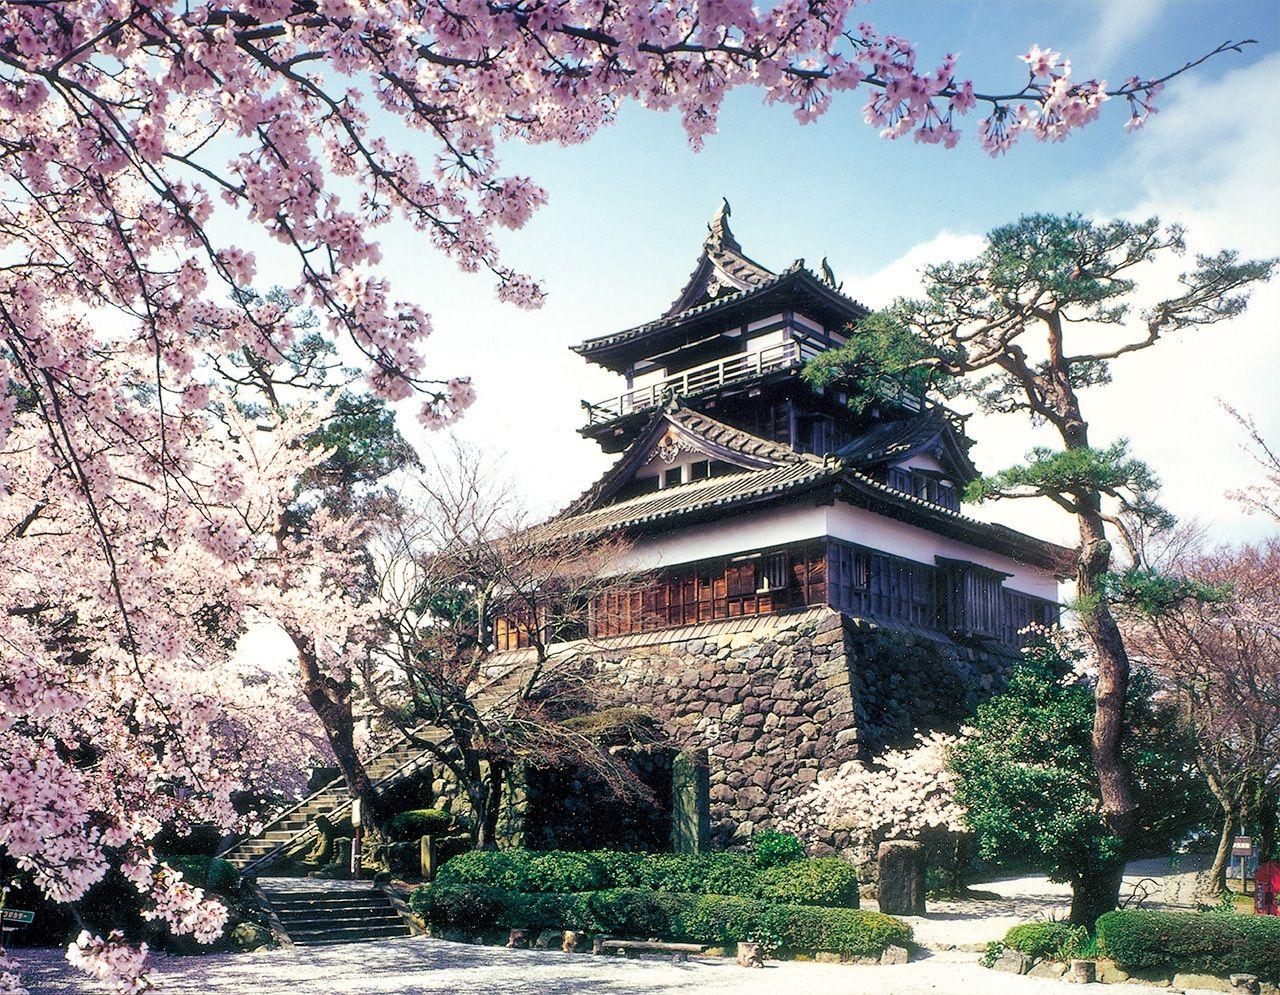 (Фотография предоставлена Ассоциацией туризма преф. Фукуи)